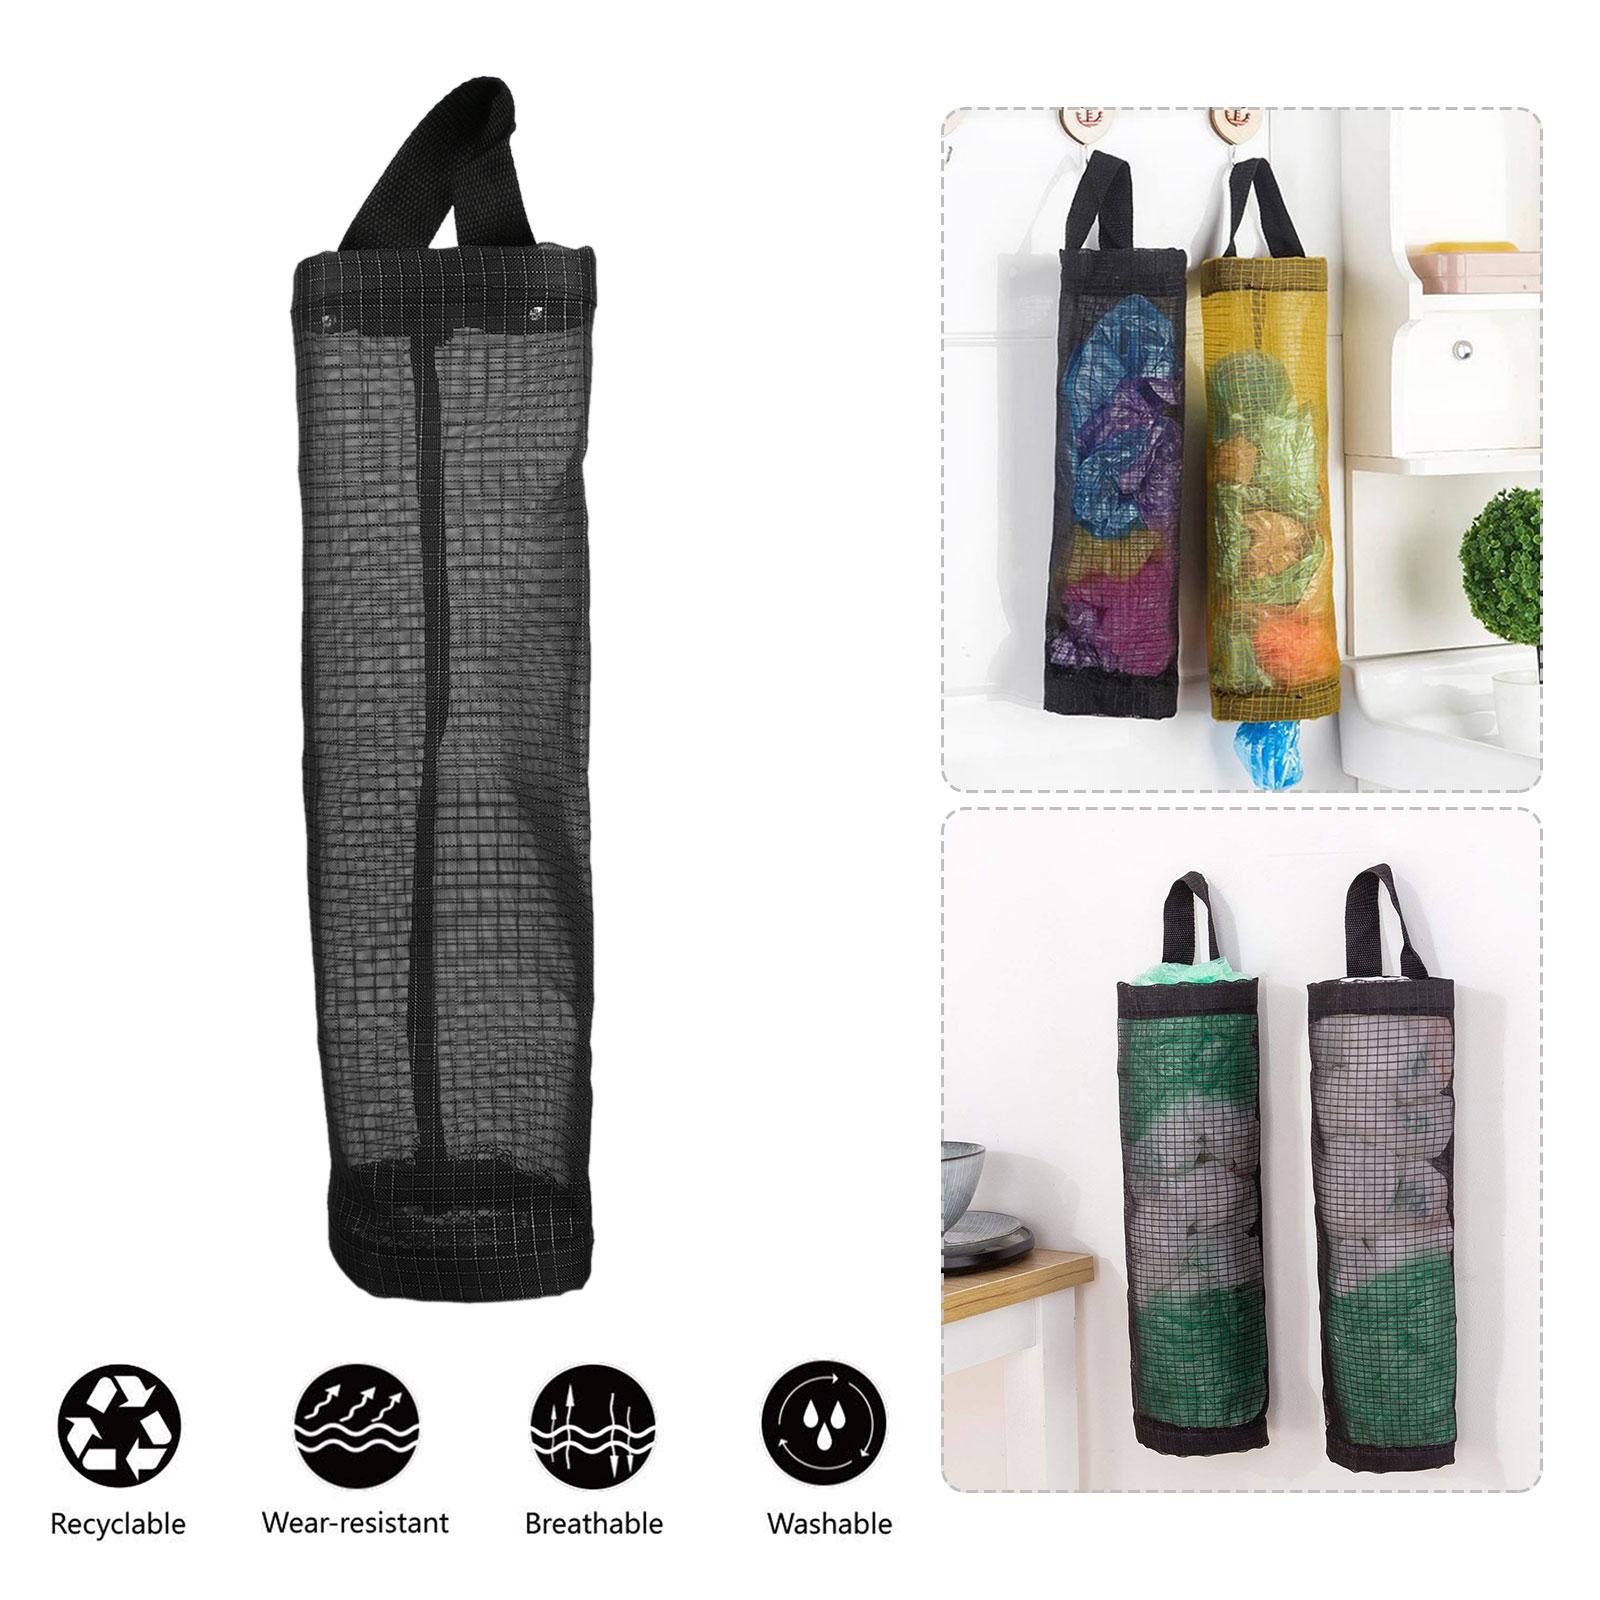 Wall Mount Carrier Bag Dispenser Garbage Rubbish Kitchen Bathroom Holder W